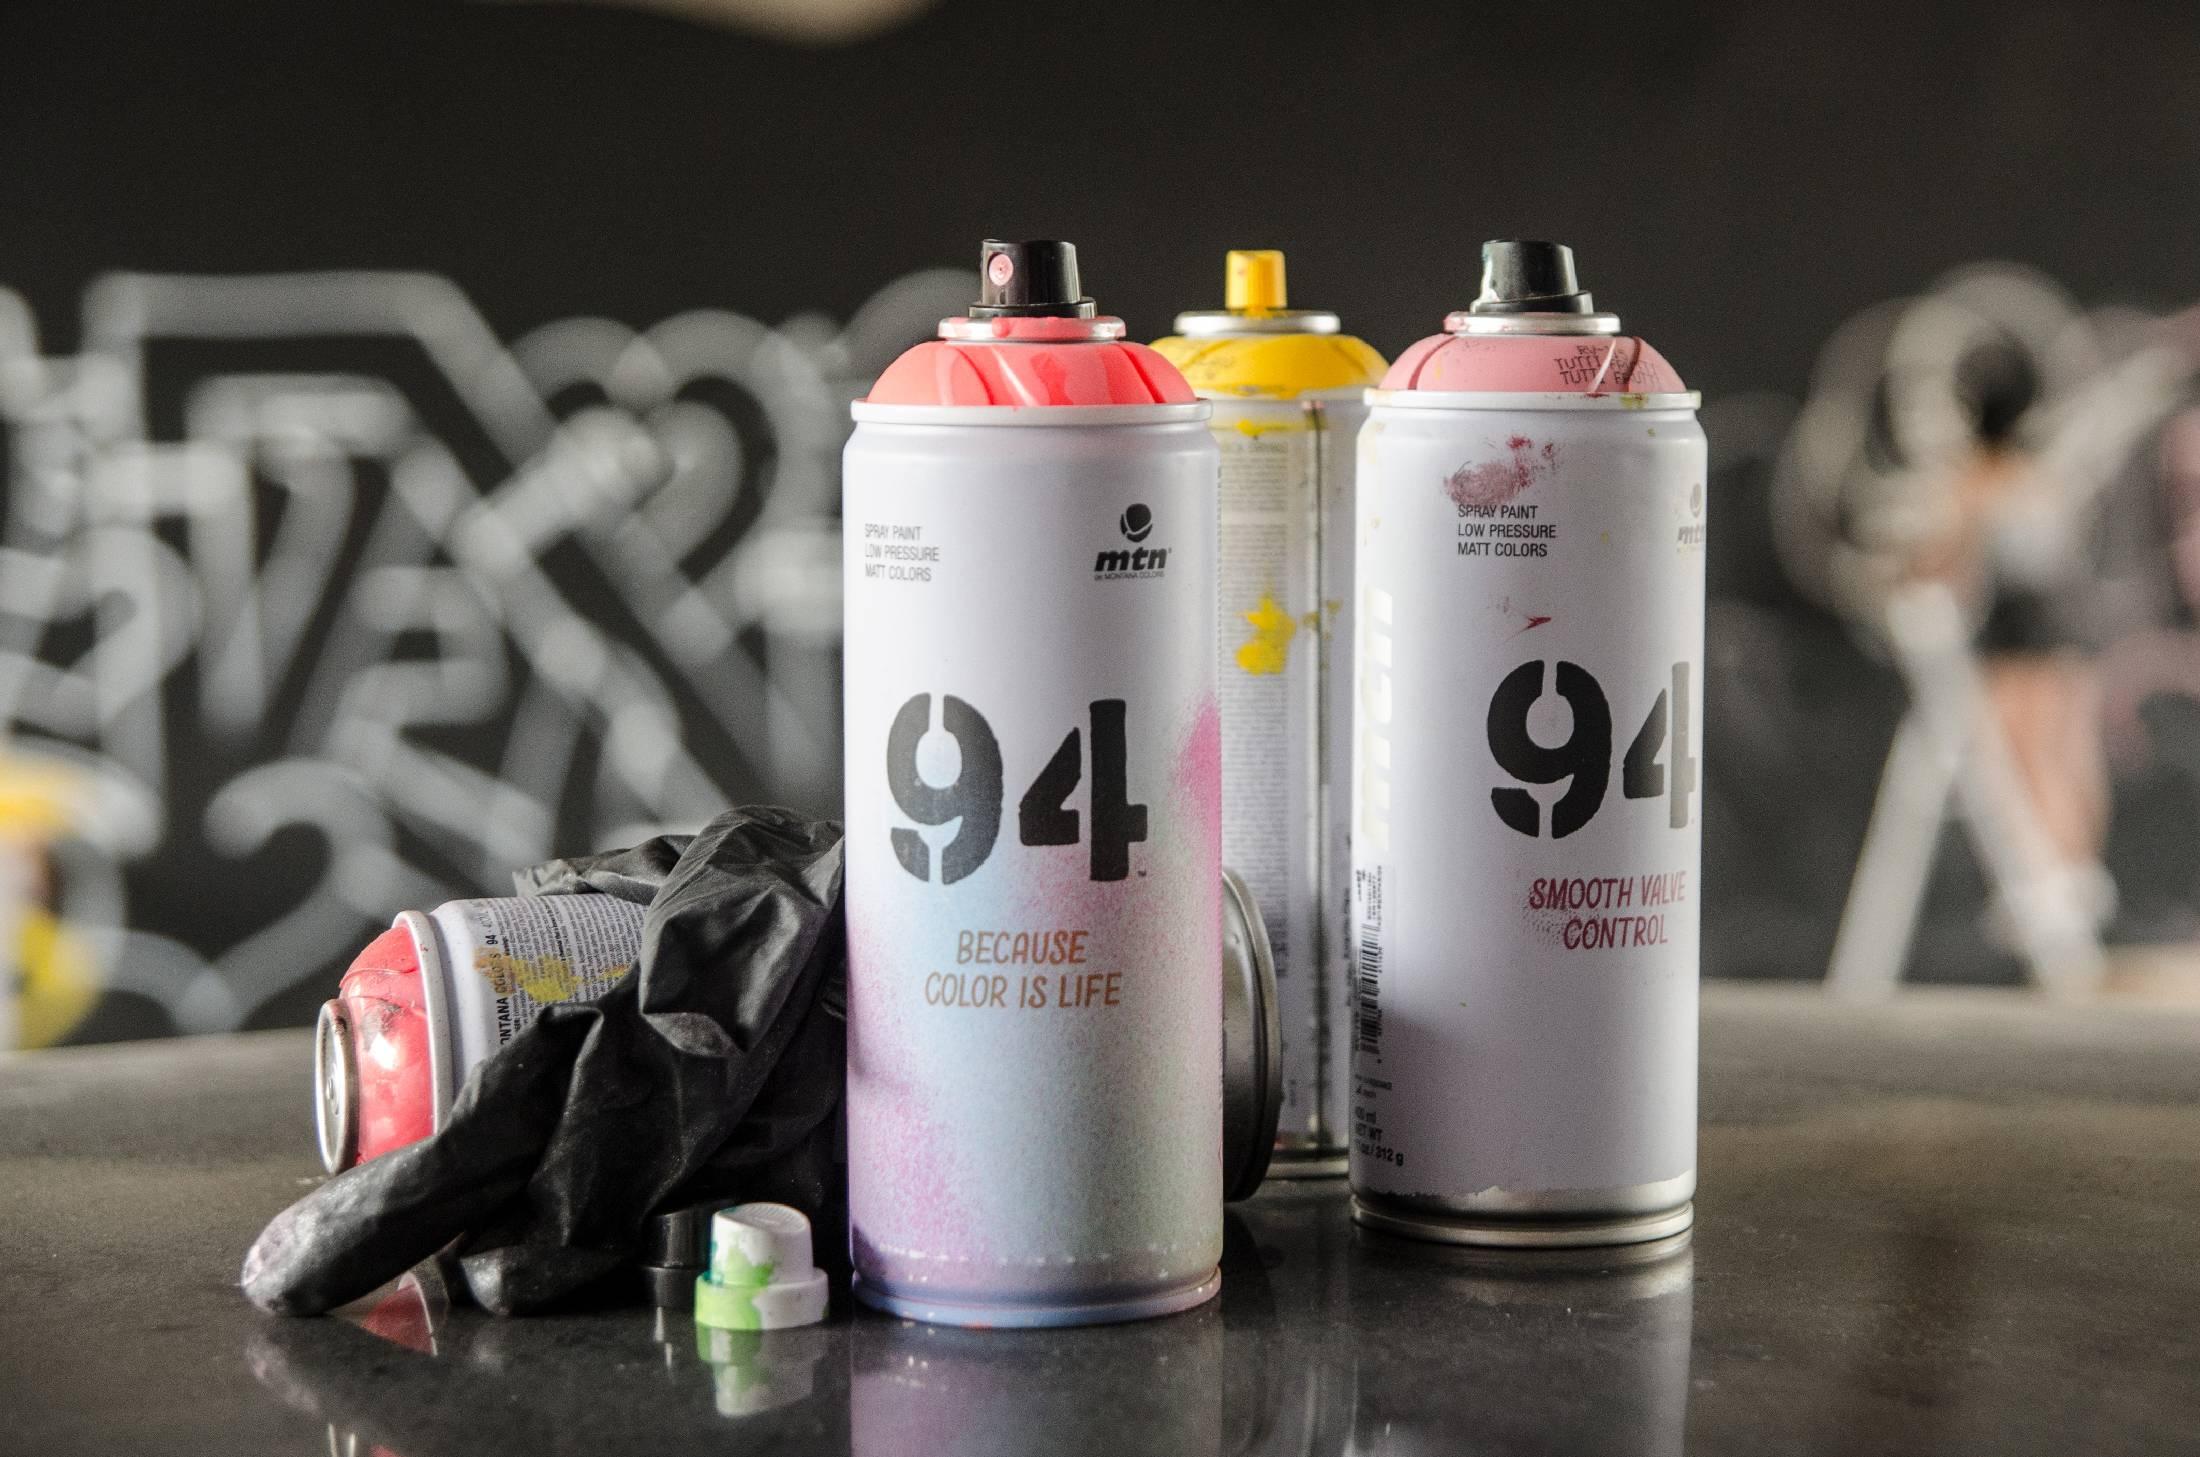 MTN 94 spray paint - matné barvy ve spreji